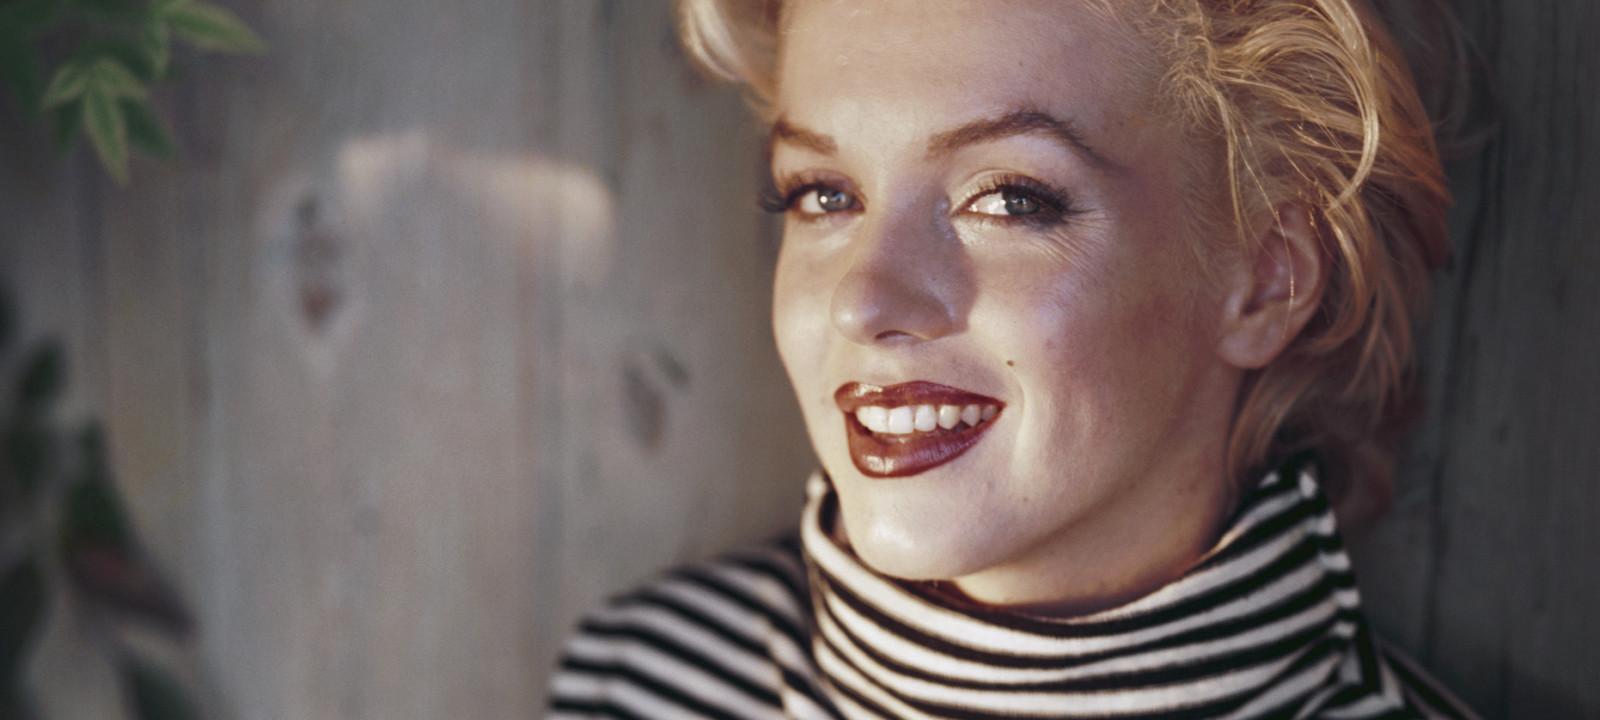 American actress Marilyn Monroe (Norma Jean Mortenson or Norma Jean Baker, 1926 – 1962).